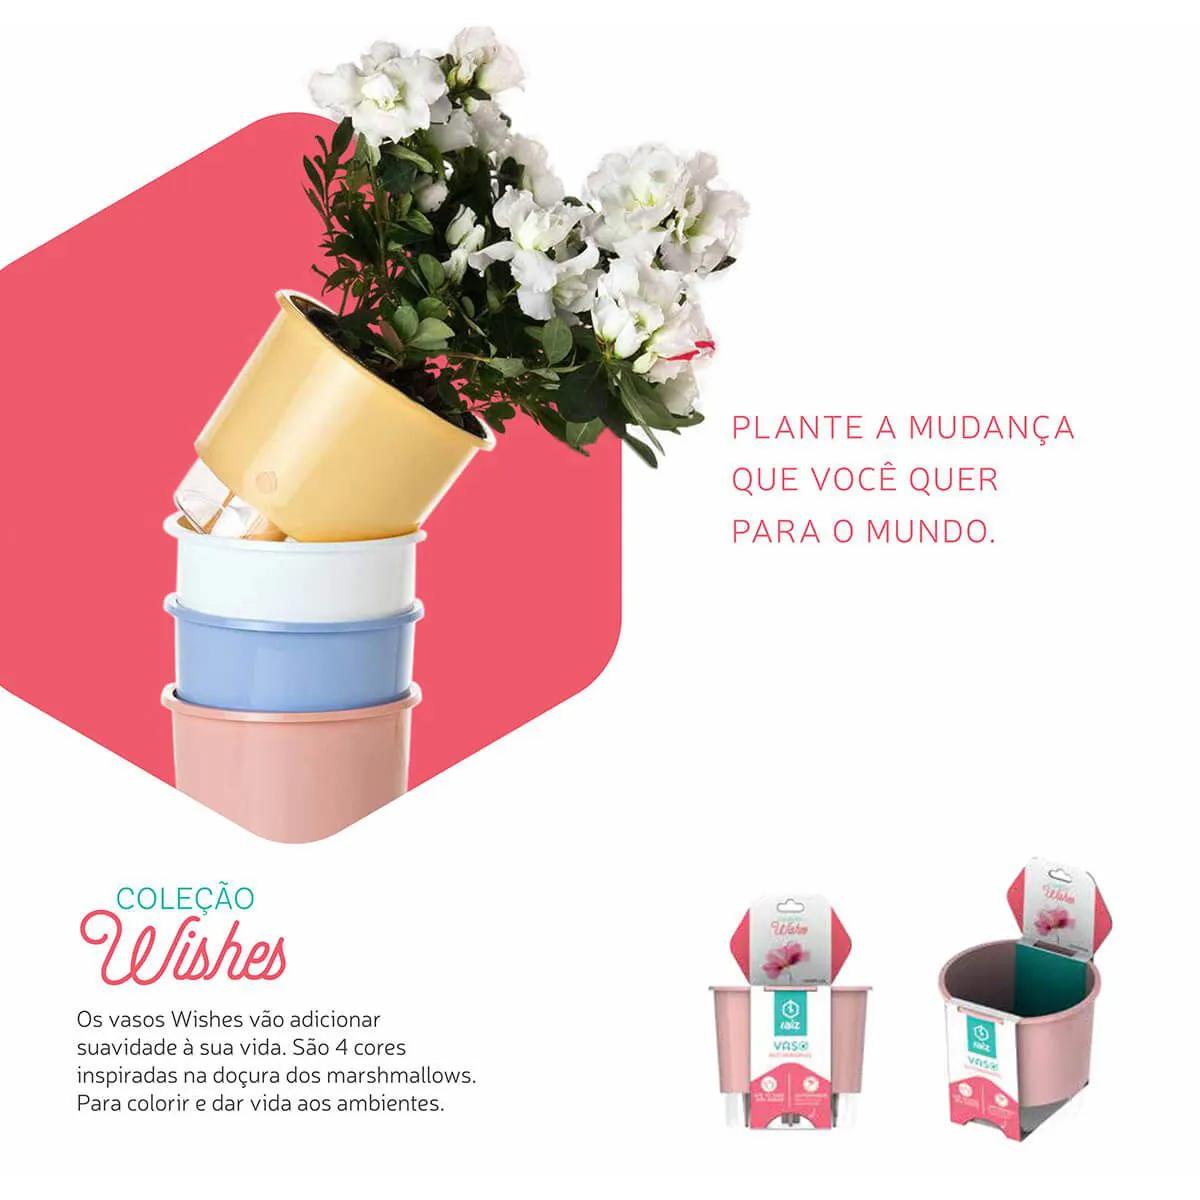 Conjunto 3 Vasos Autoirrigáveis - Azul Serenity Plante o Bem - Pequenos 12cm x 11cm - N02  - Vasos Raiz Loja Oficial